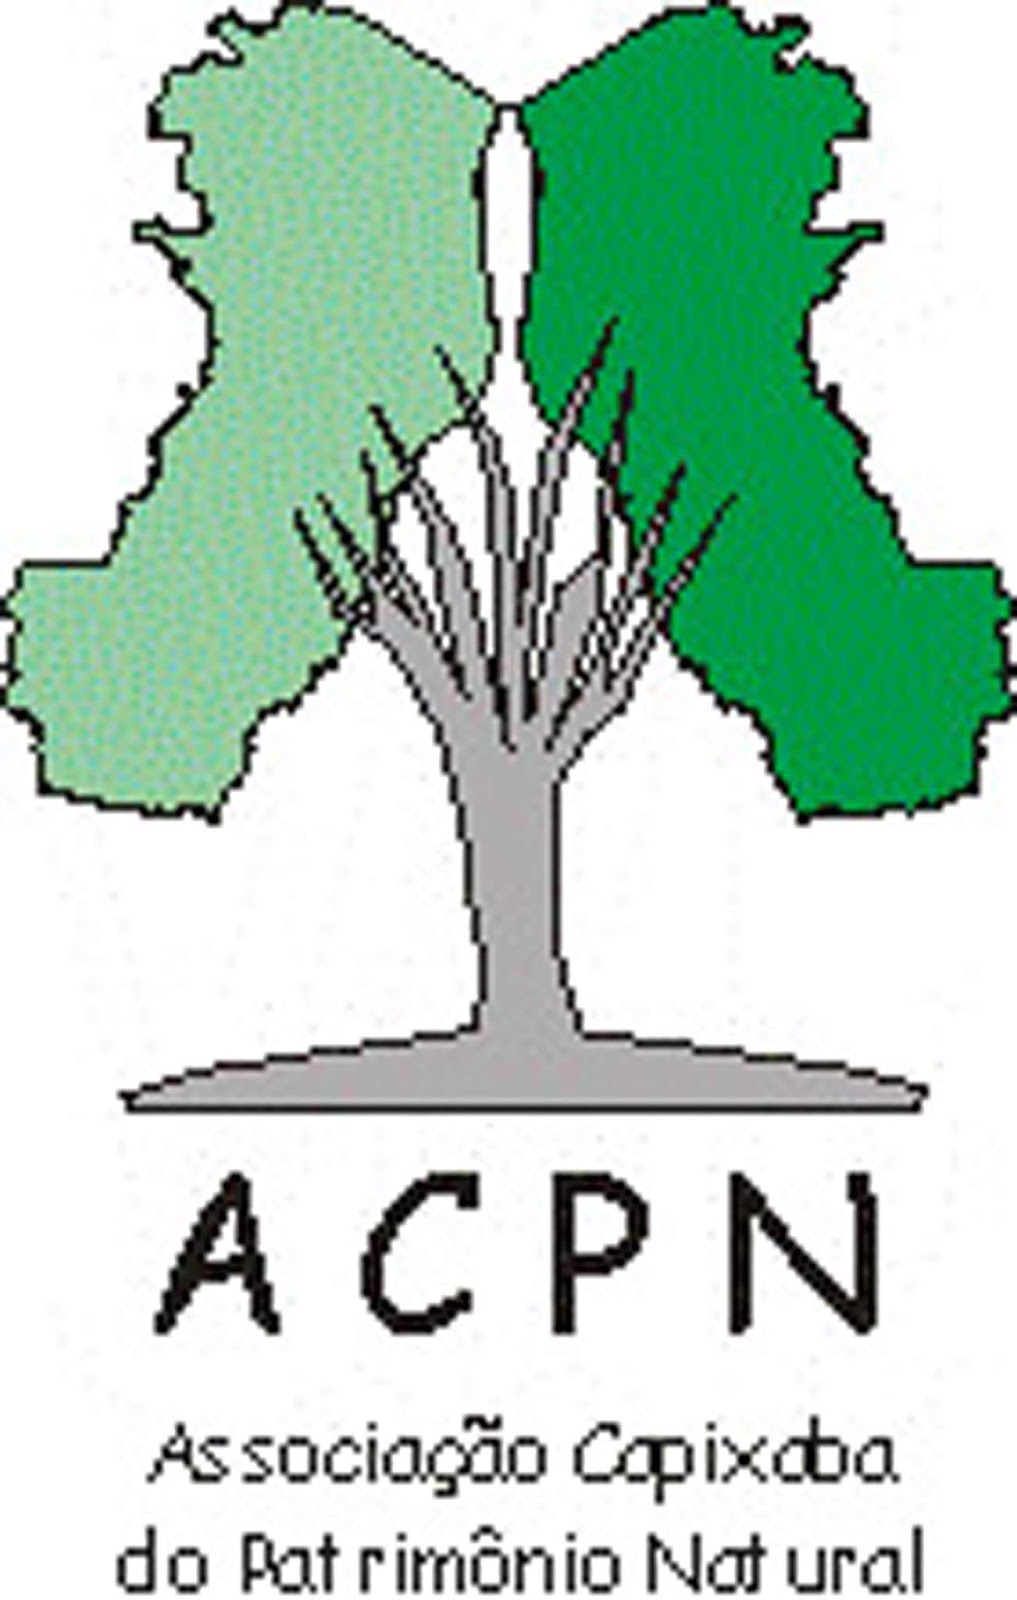 Logo ACPN 2 x 3 (2) (1)